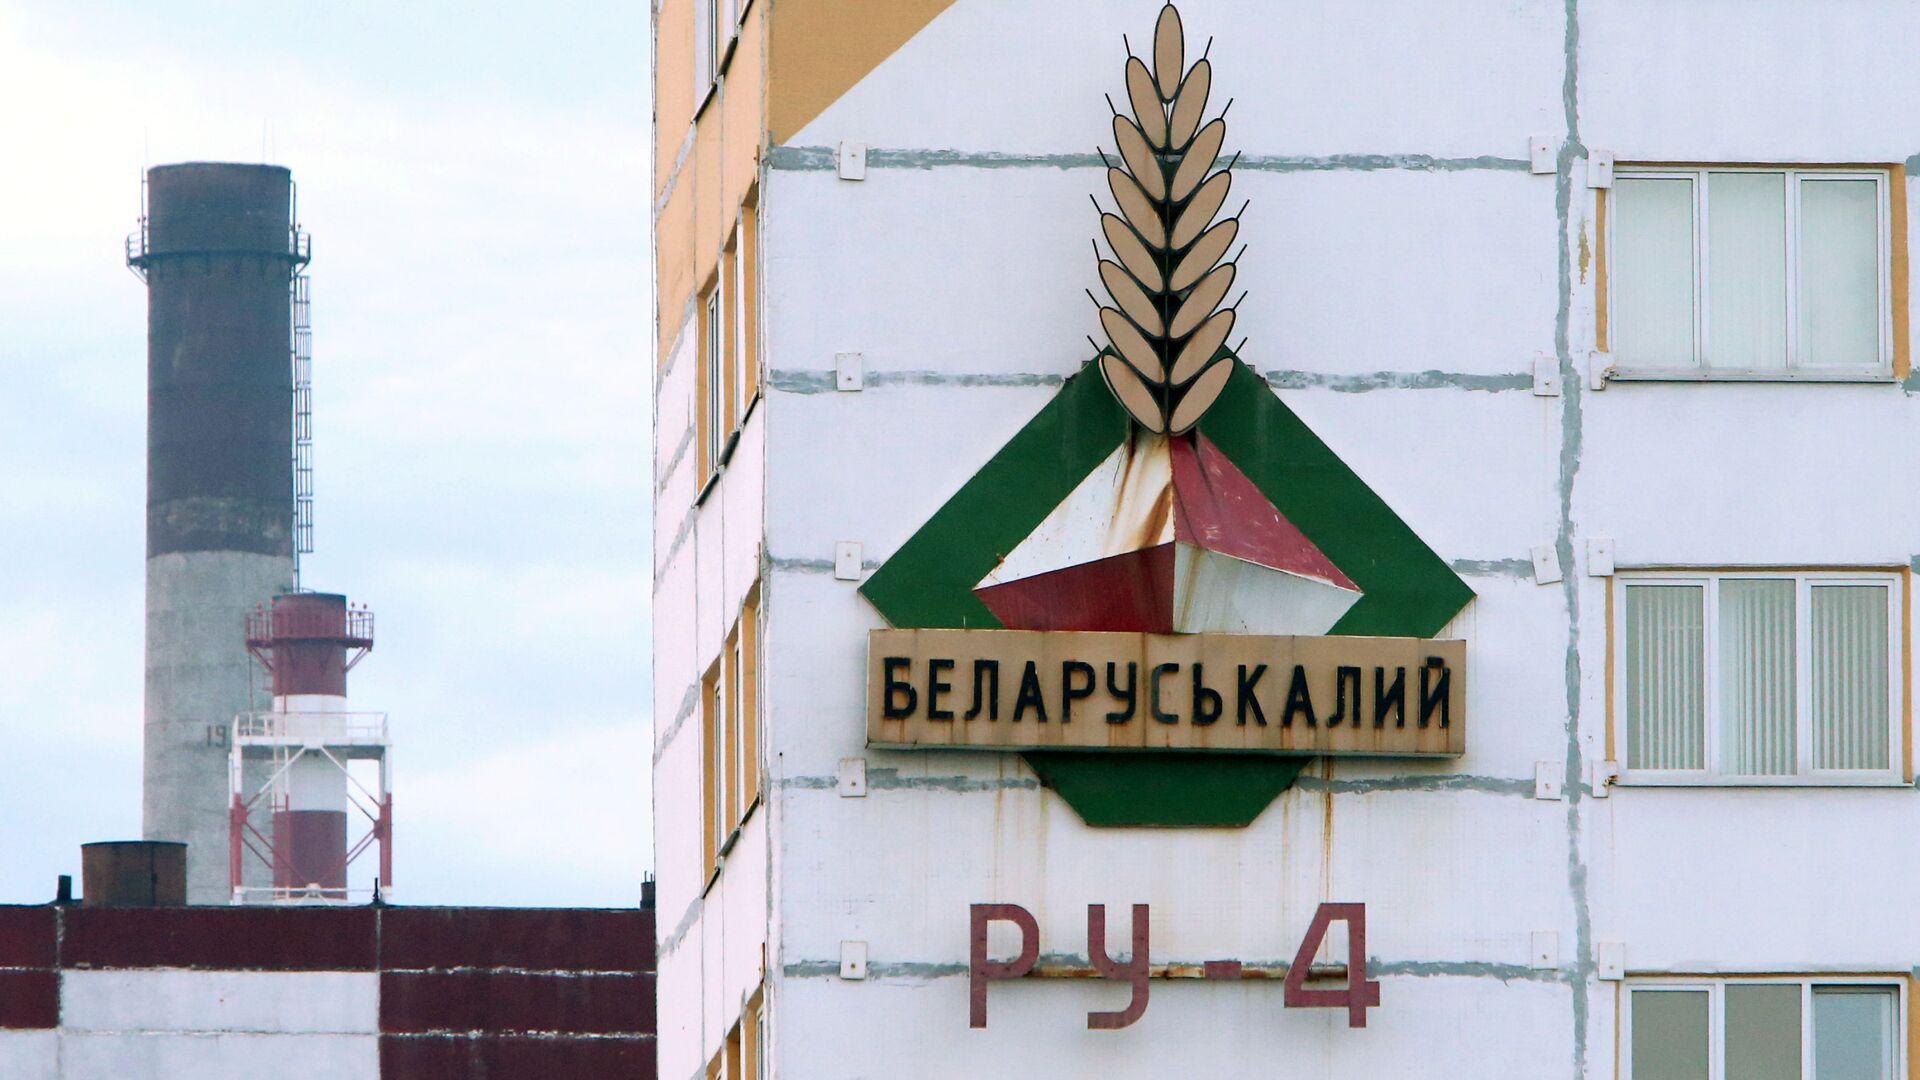 Беларуськалий остановил работу половины рудников - Sputnik Latvija, 1920, 29.05.2021